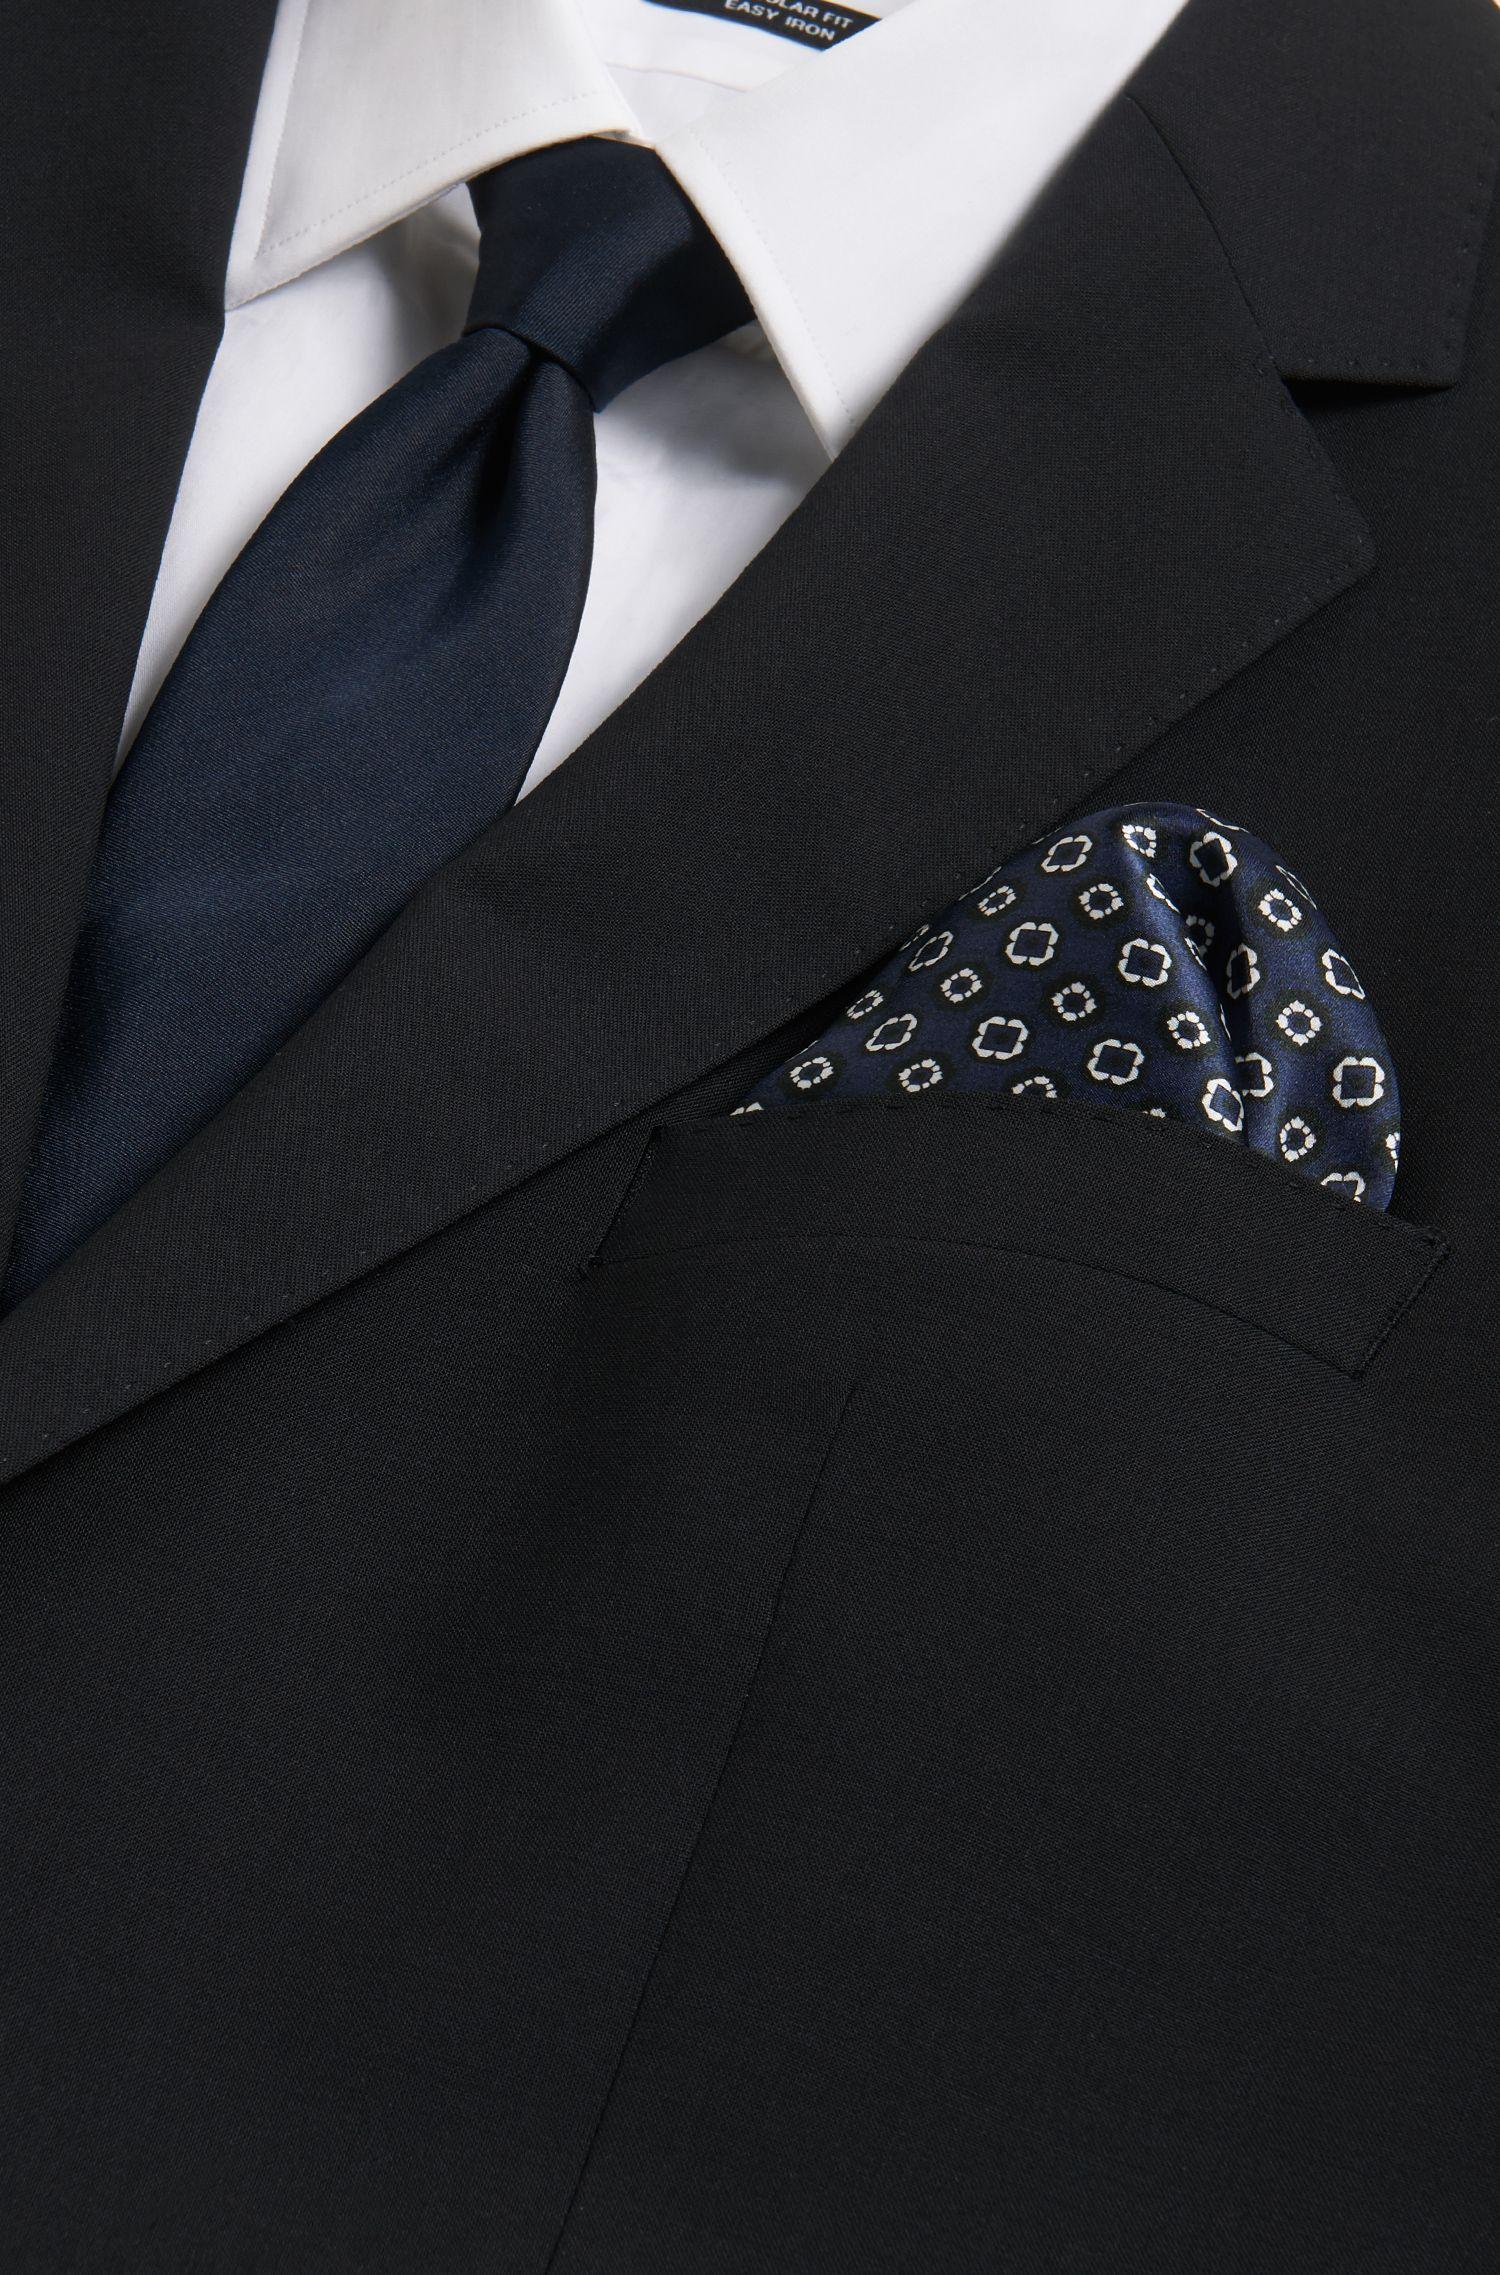 Tile-Patterned Italian Silk Pocket Square, Dark Blue